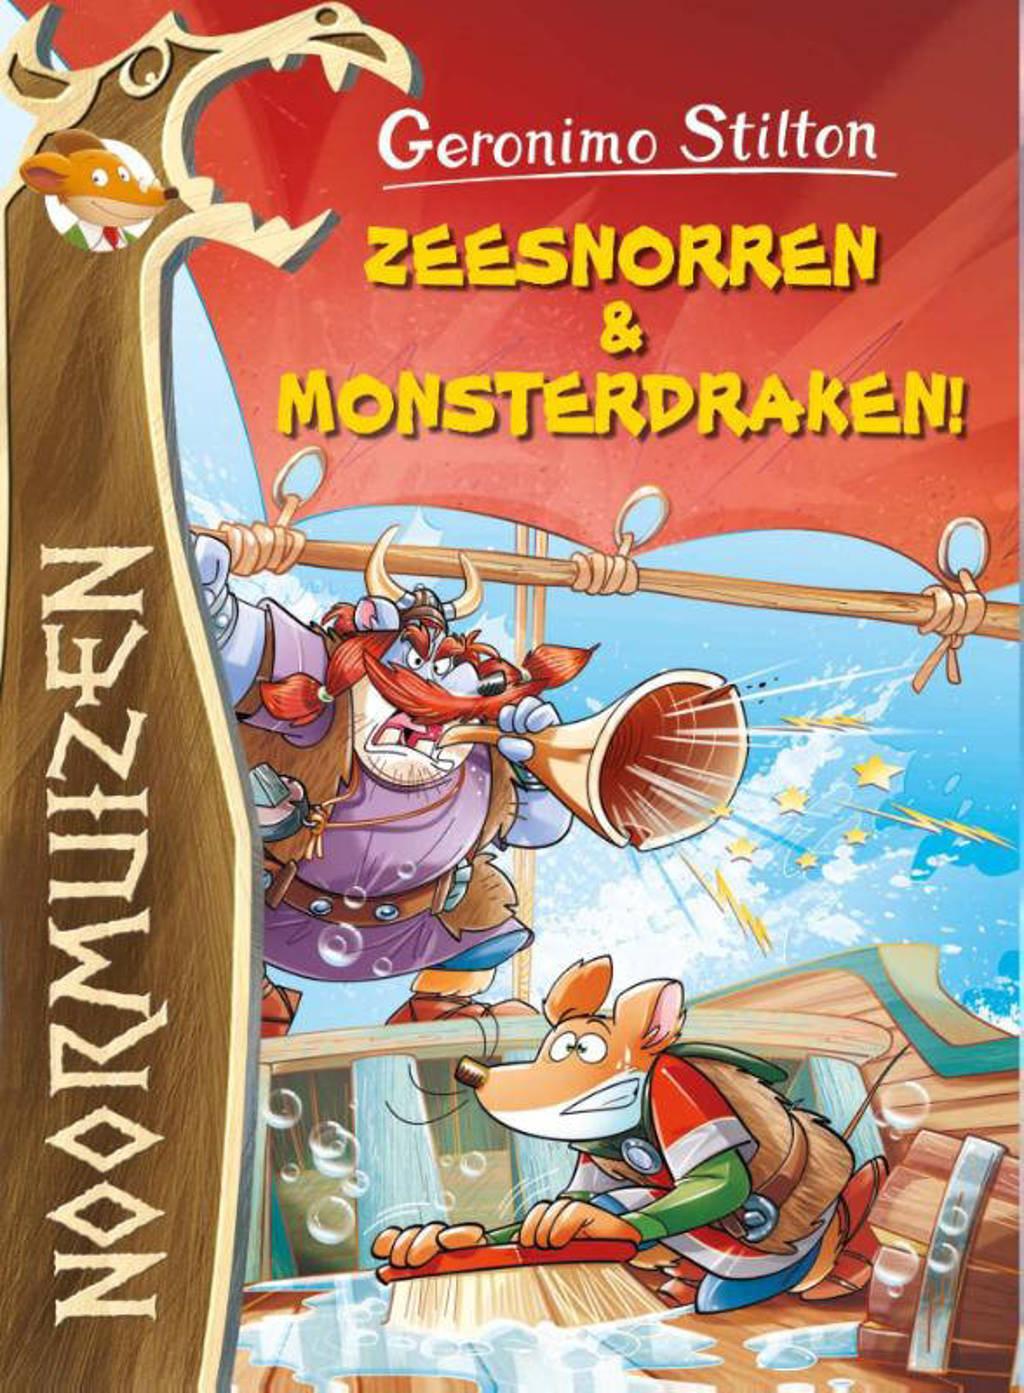 Zeesnorren en monsterdraken - Geronimo Stilton